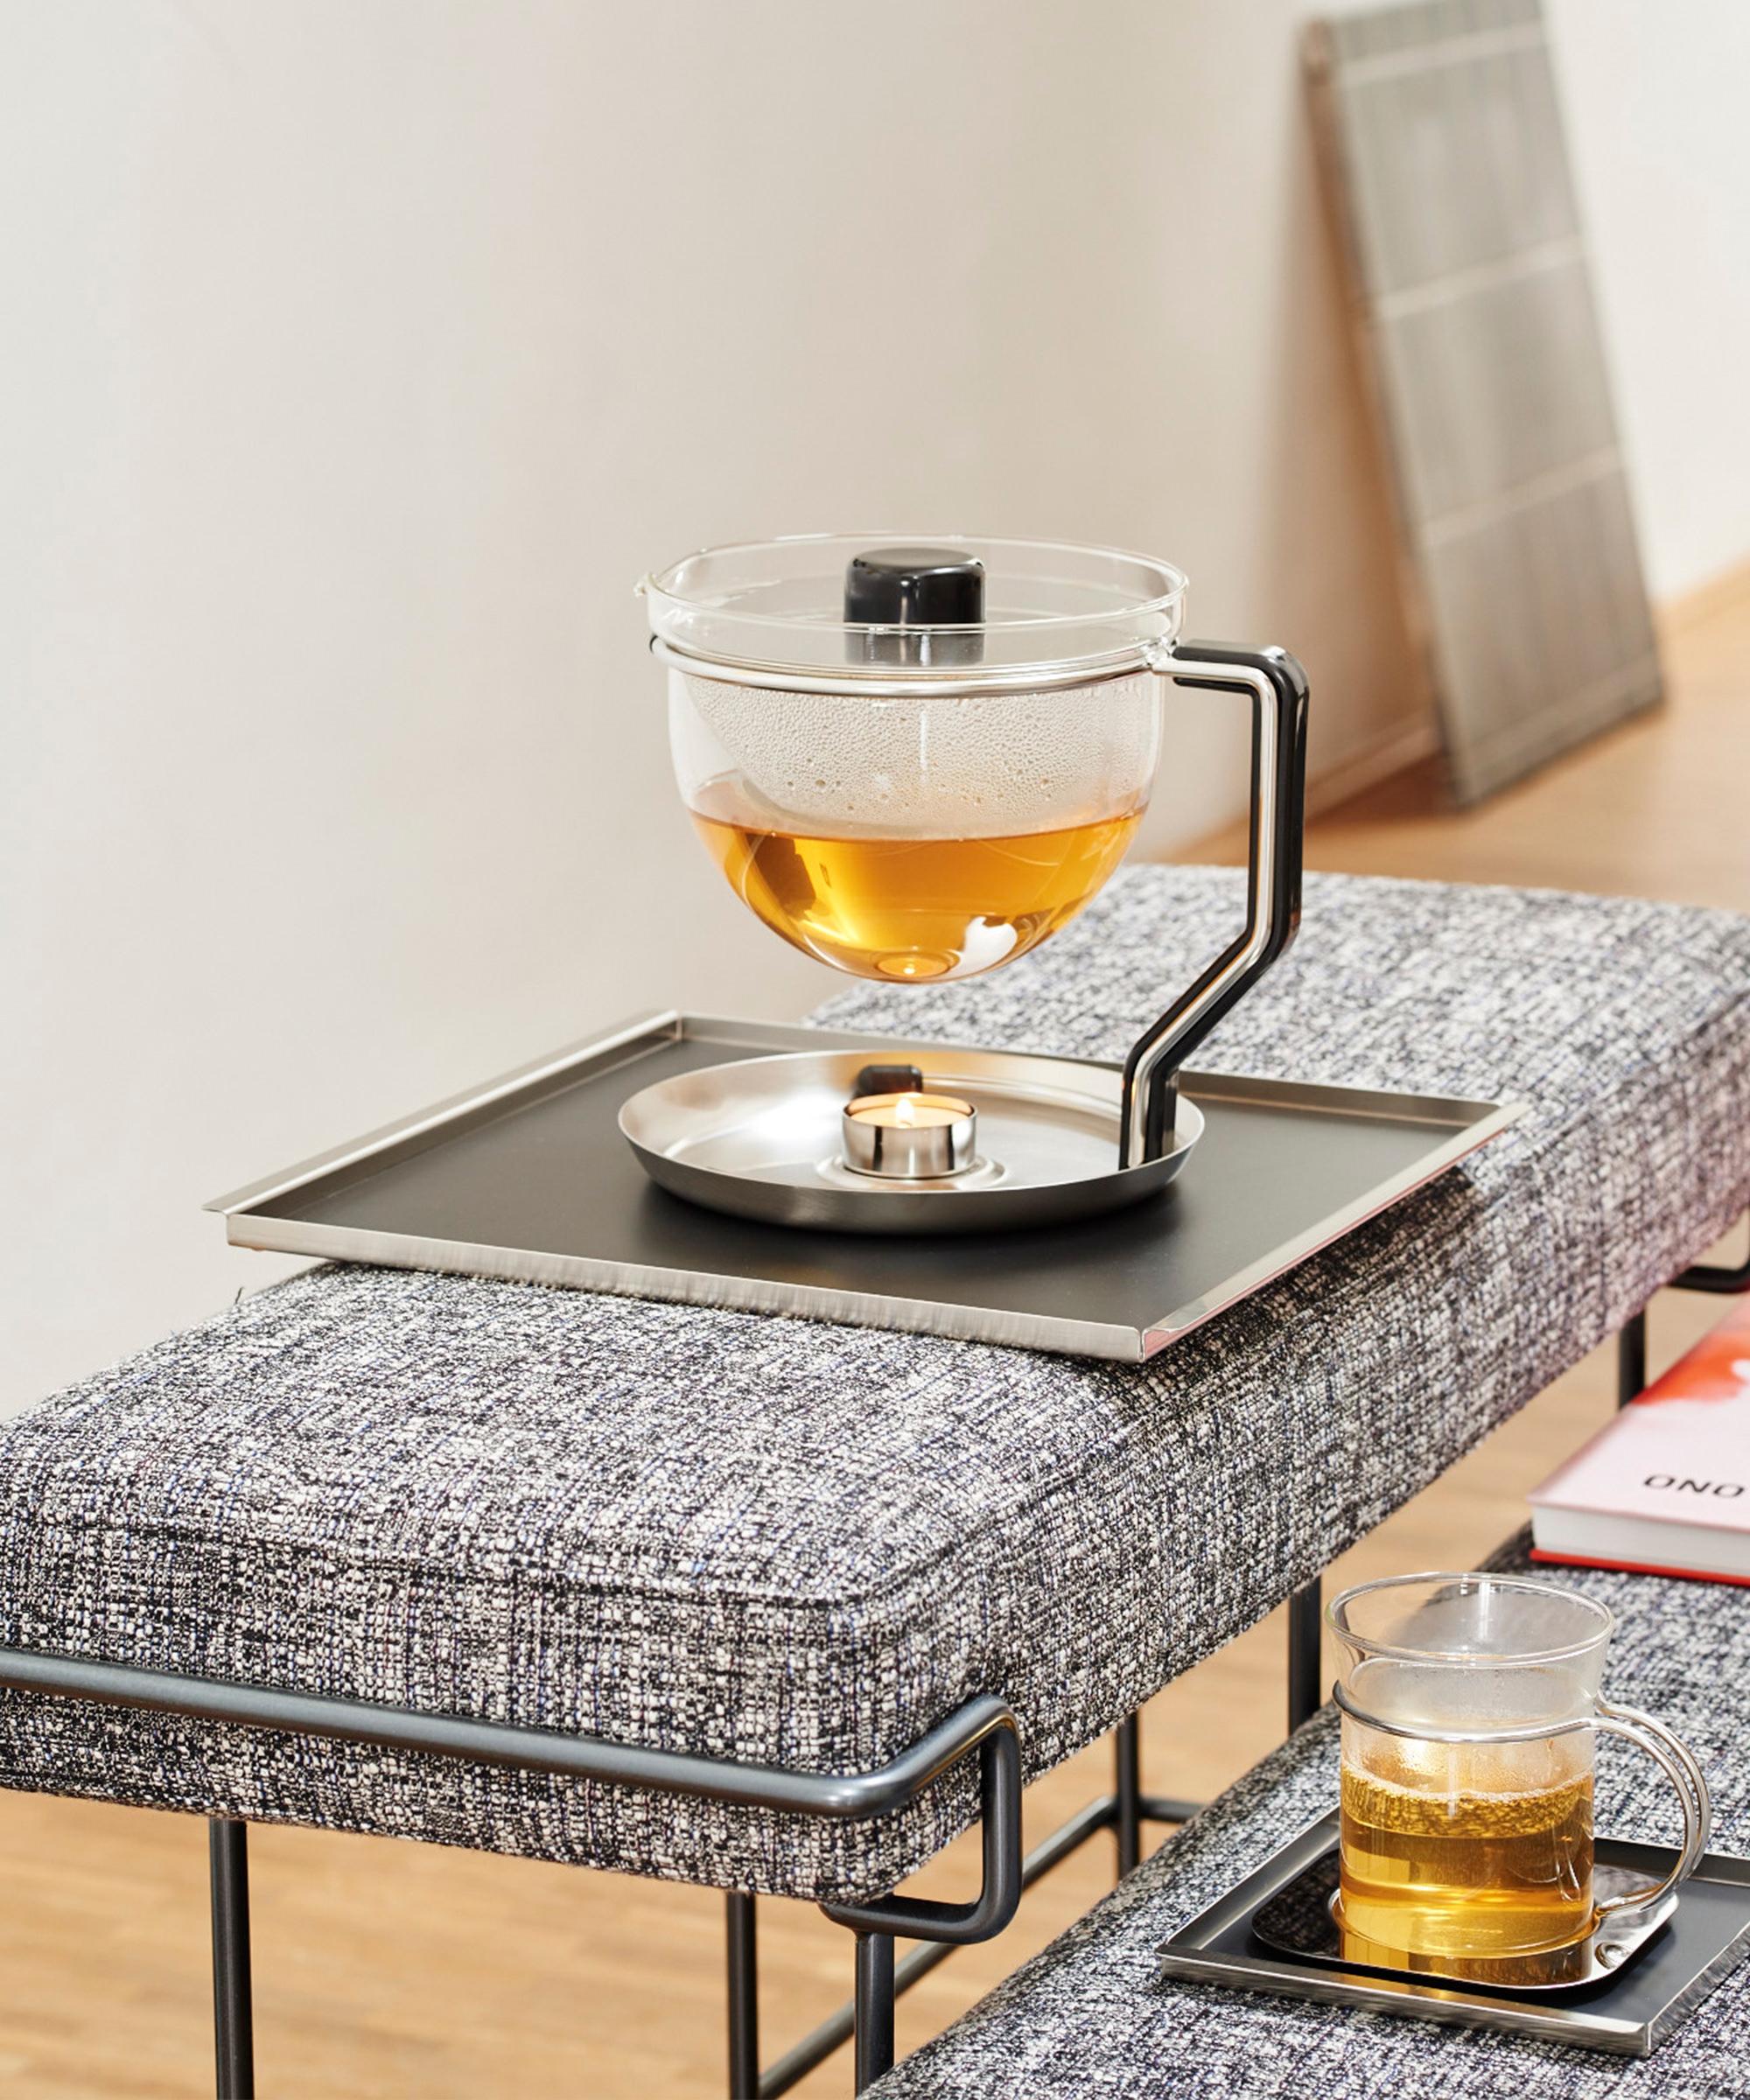 10400 Mono Classic Teekanne Teapot 01